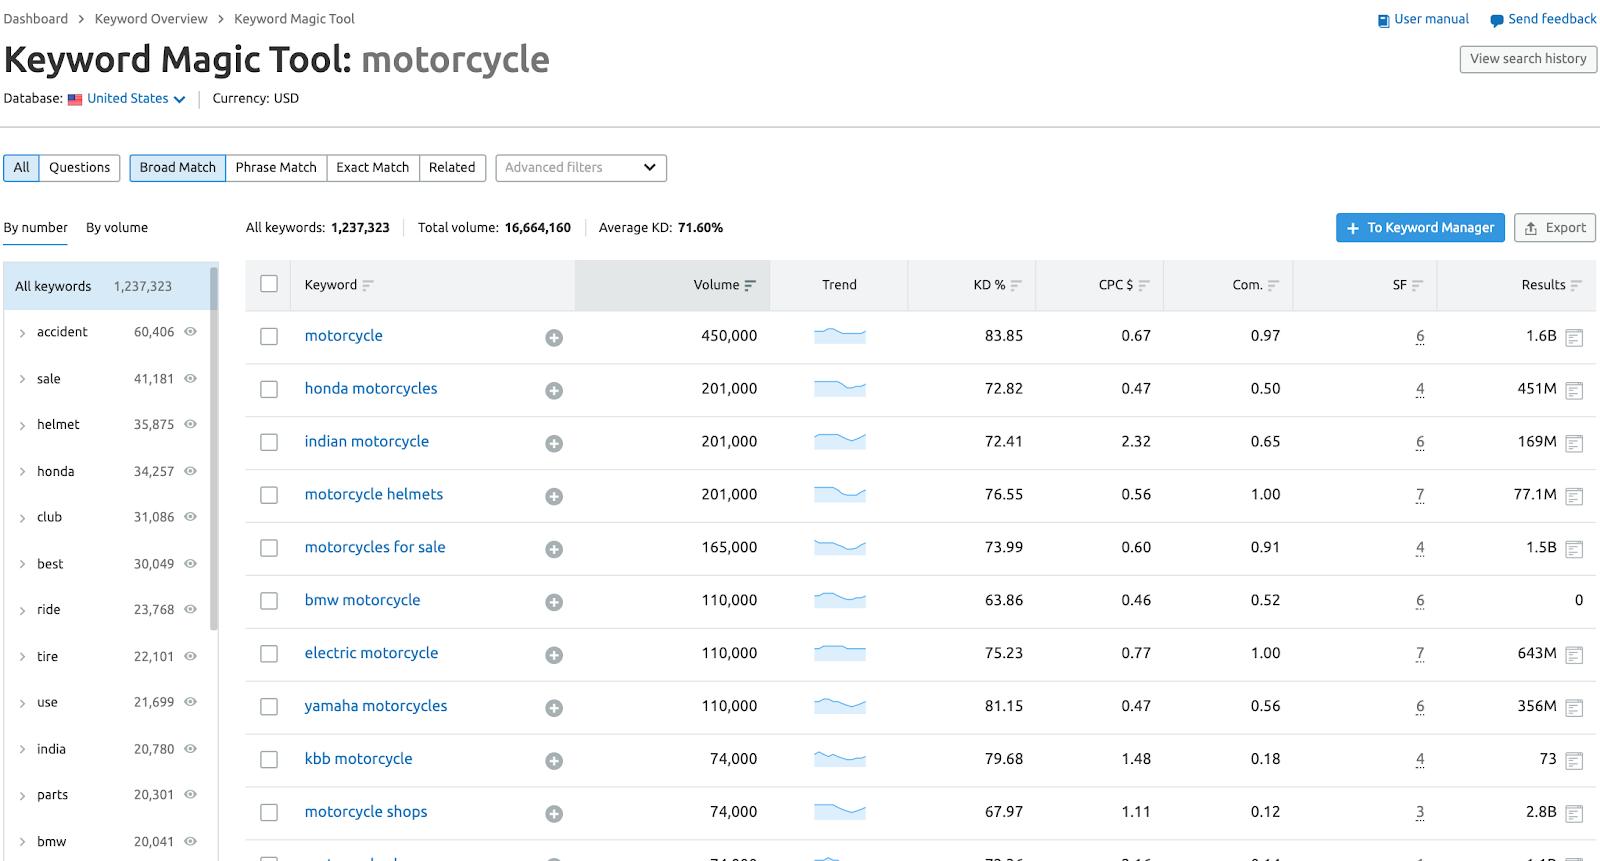 Keyword Magic Tool - Motorcycle